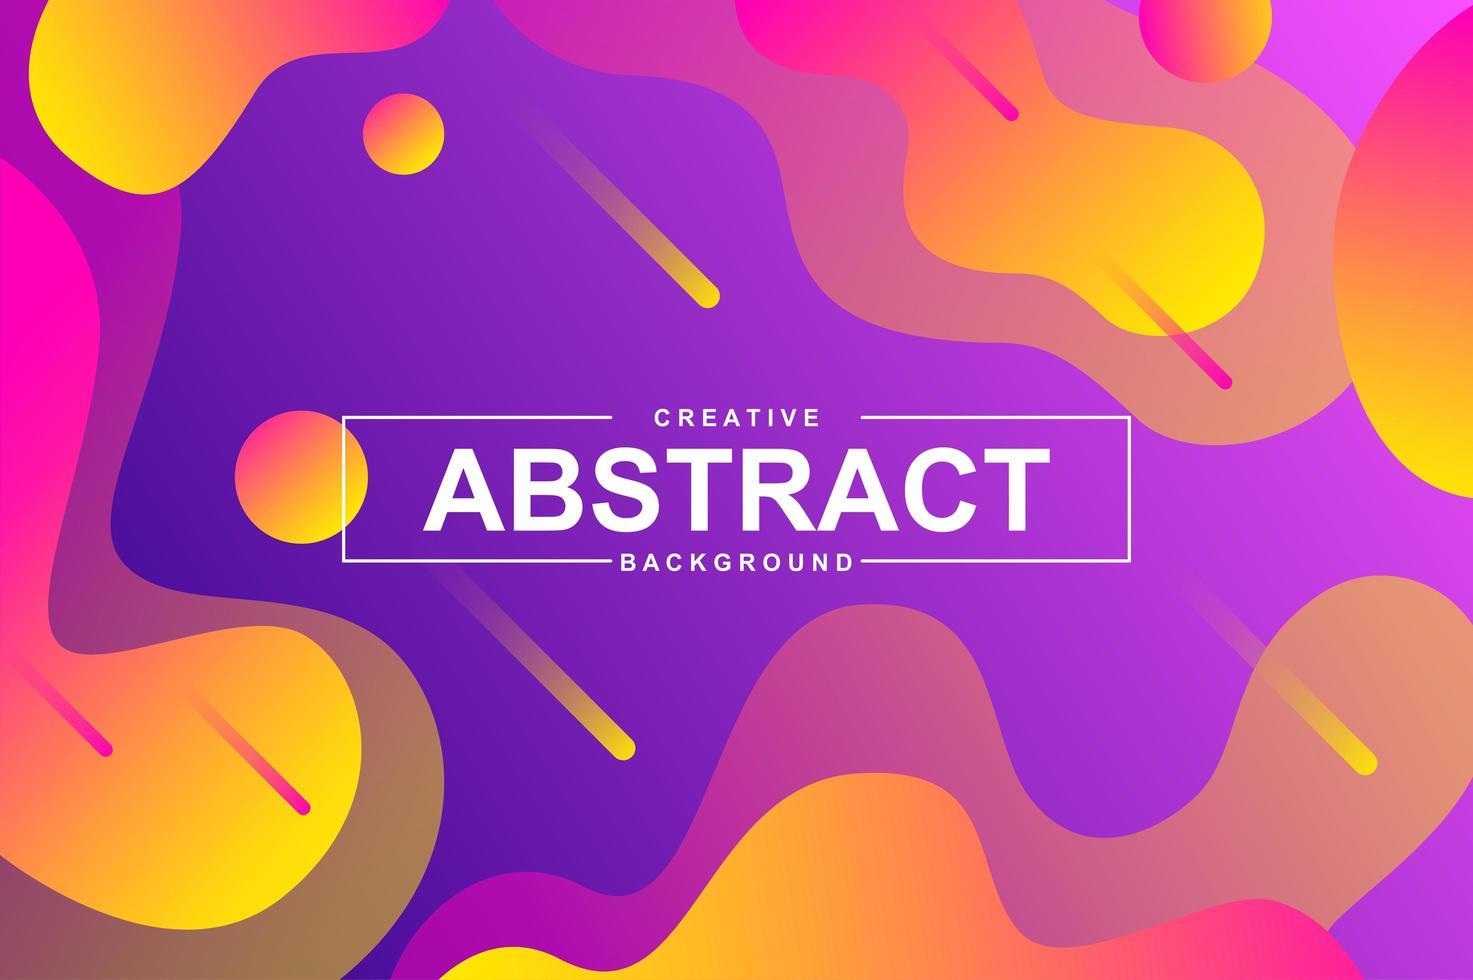 abstrakt bakgrundsdesign med dynamiska flytande former. vektor